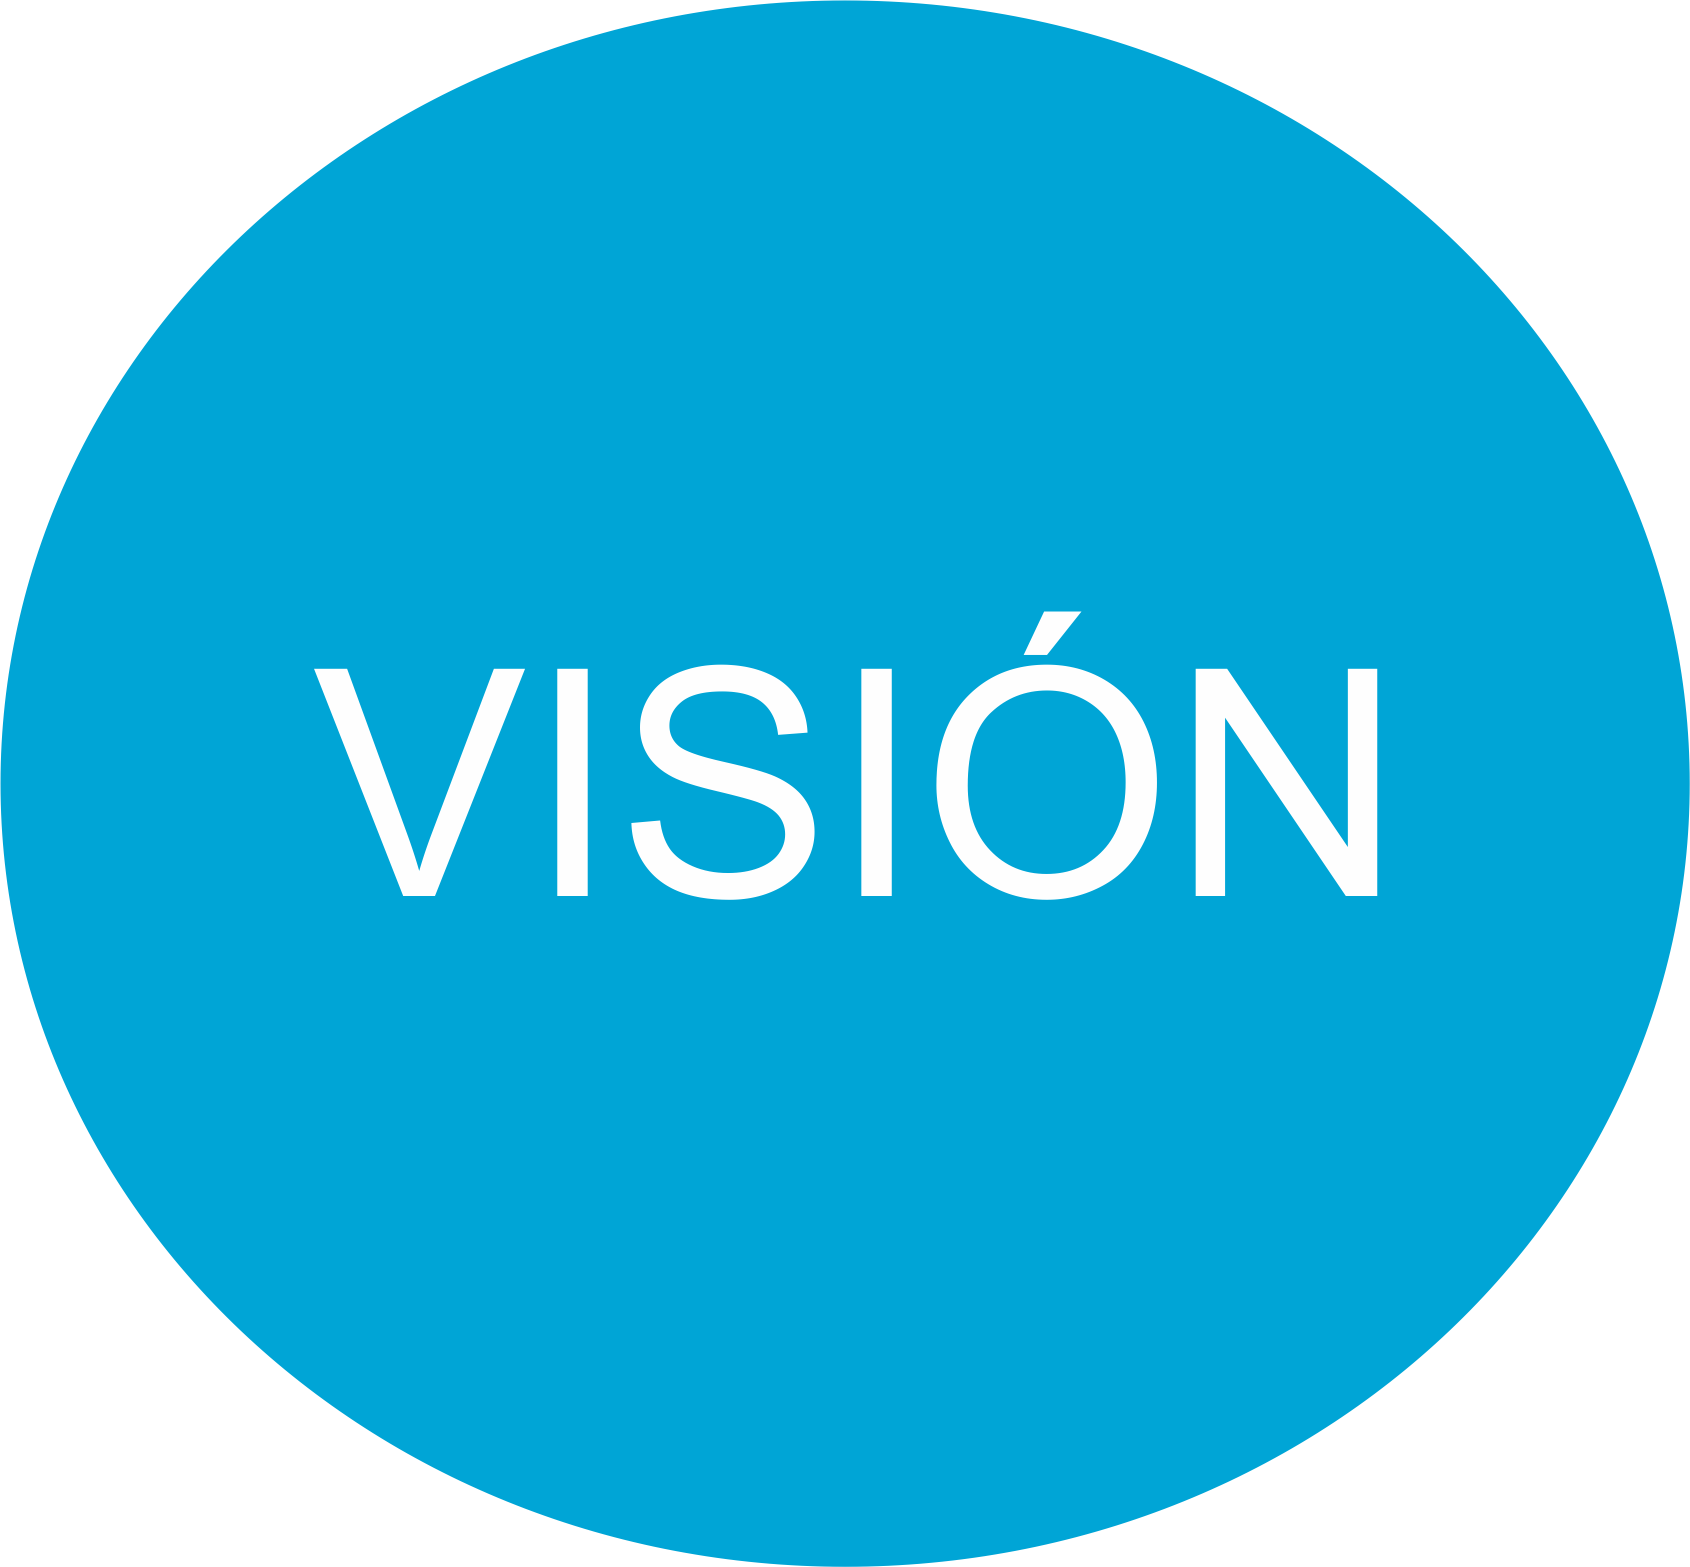 Filename: Vision.png - Vision PNG